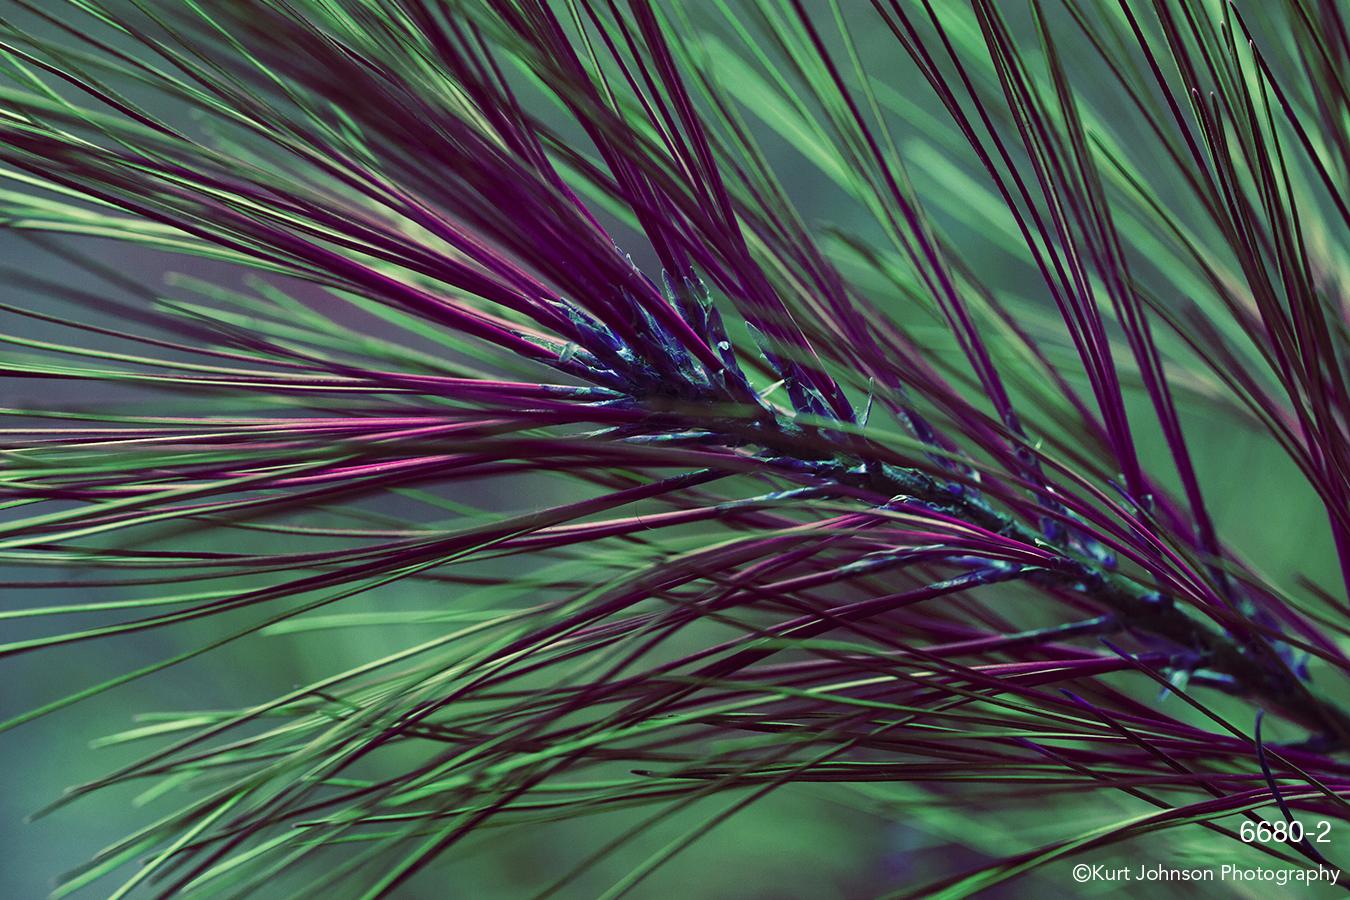 interpretations interpretation purple filter green pine needles leaves closeup